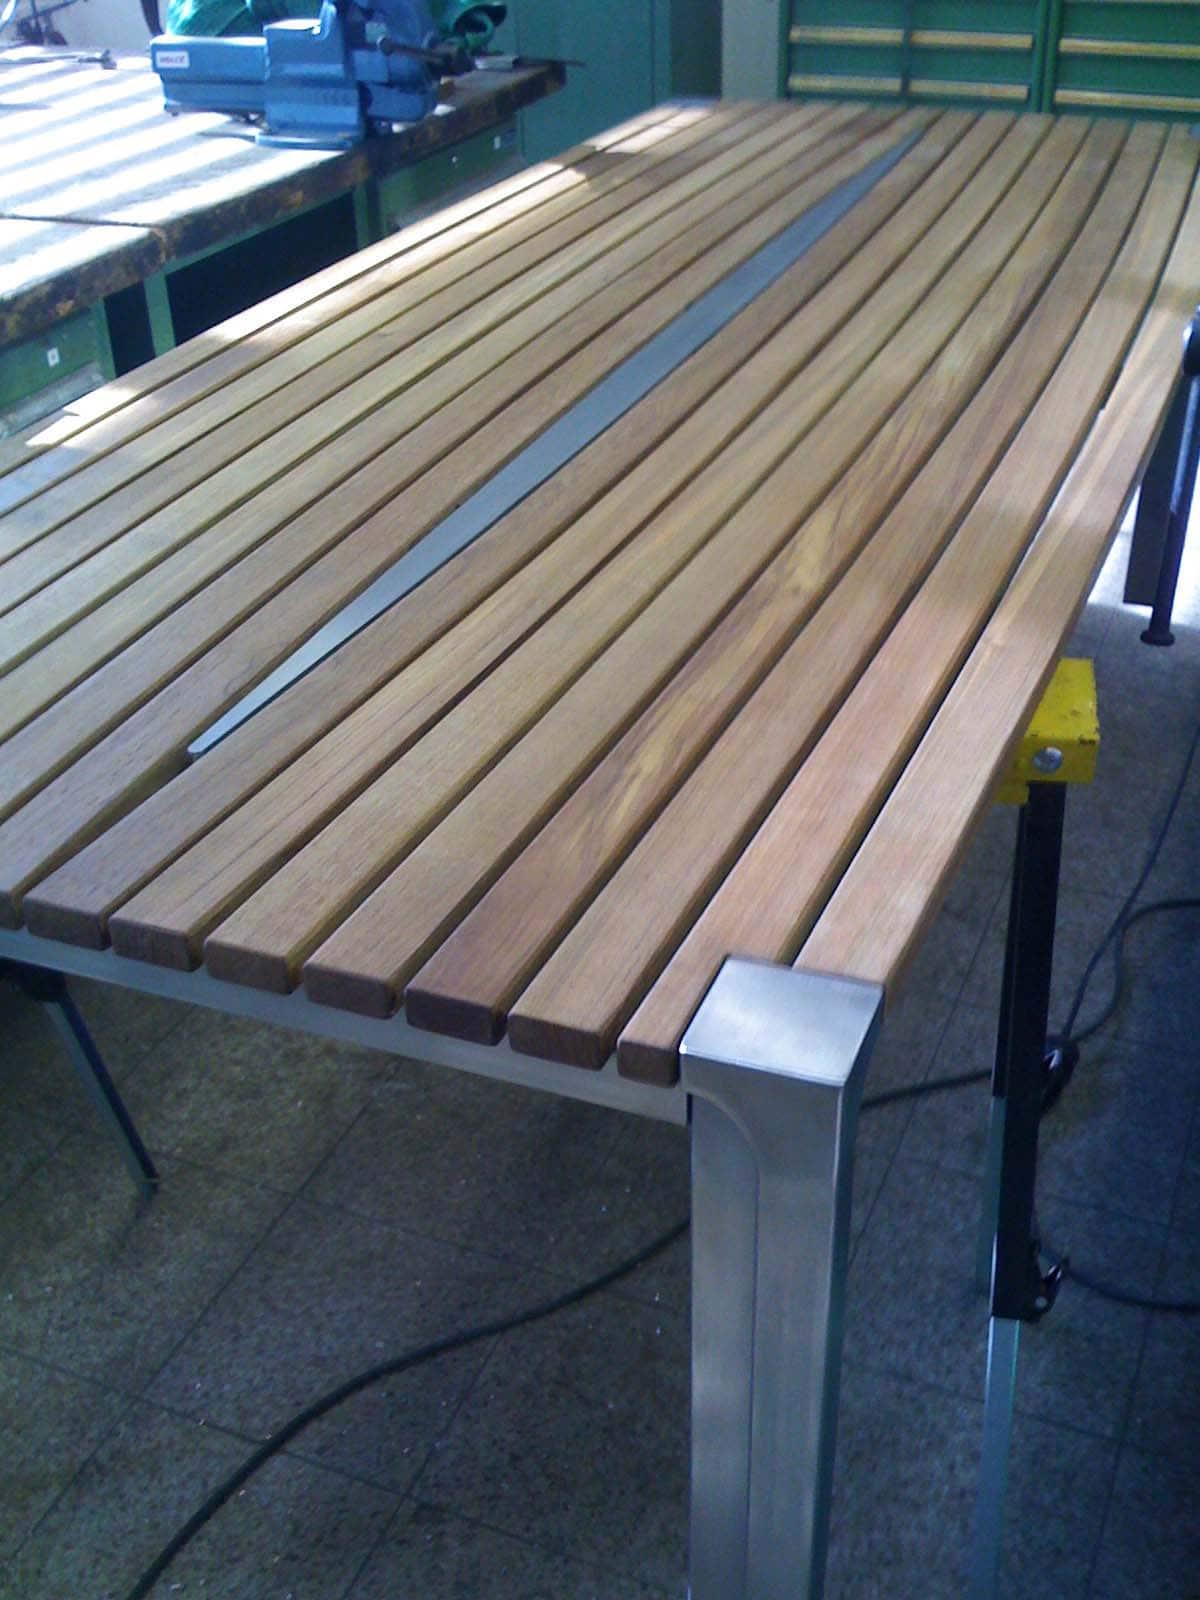 Design Tisch Sealine Nummer 5 aus Stahl Holz by Sebastian Bohry